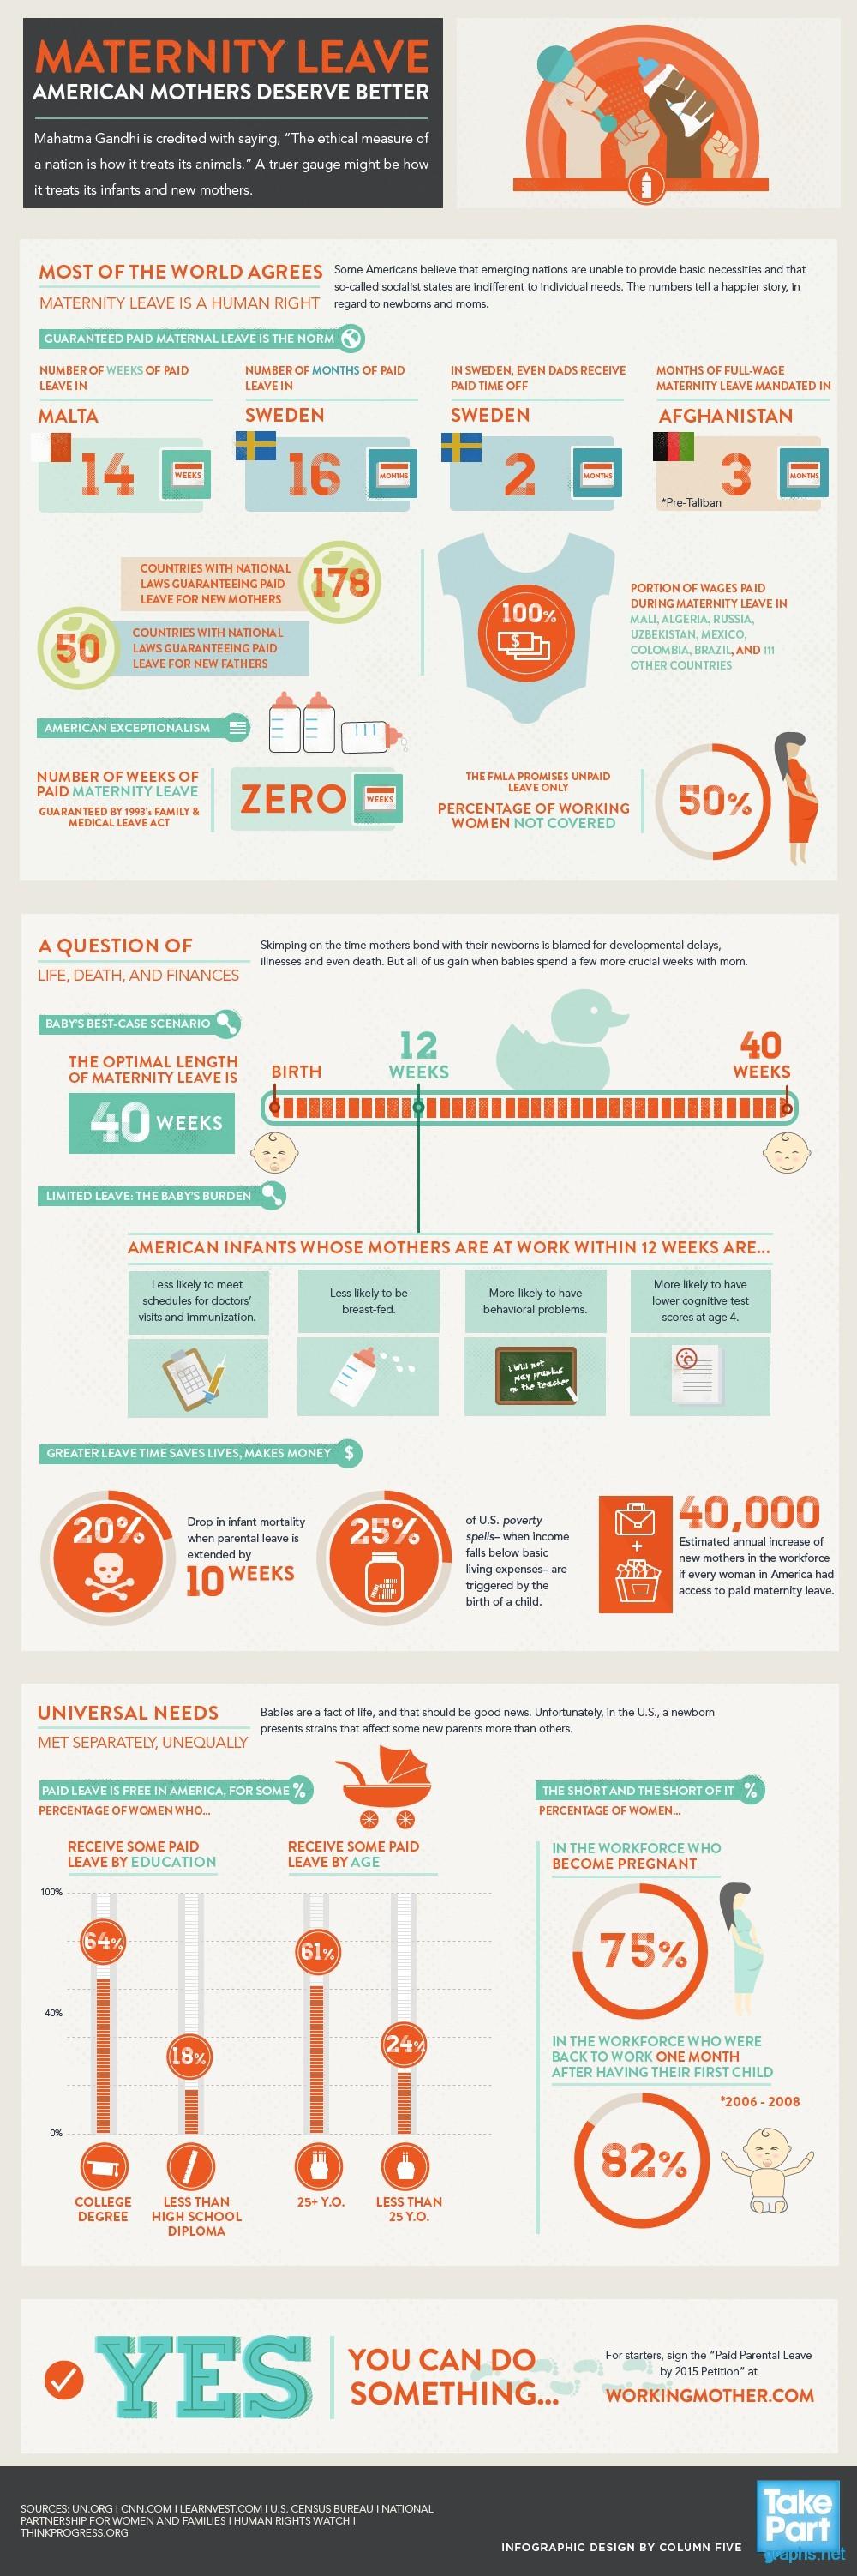 maternity leave statistics